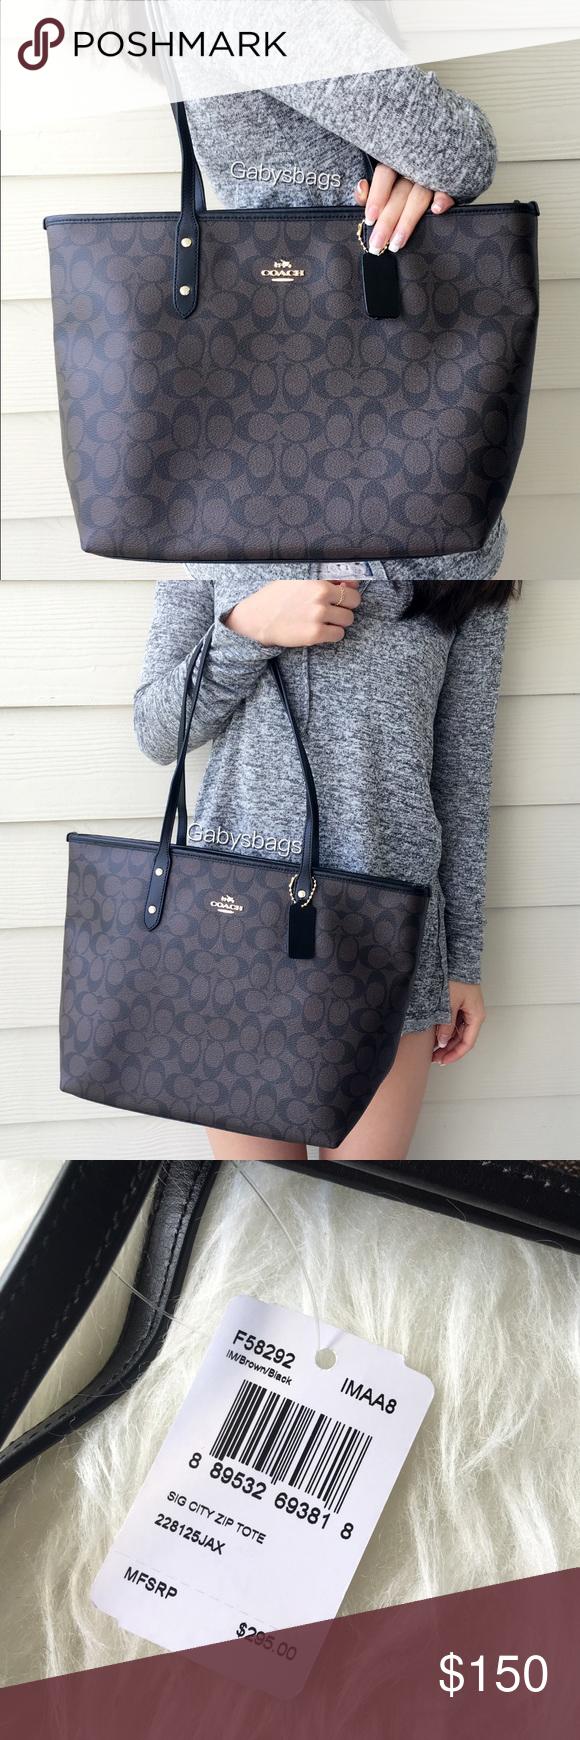 Coach F58292 Signature Zip Tote Brown Boutique Pinterest New City Handbag Womens Style